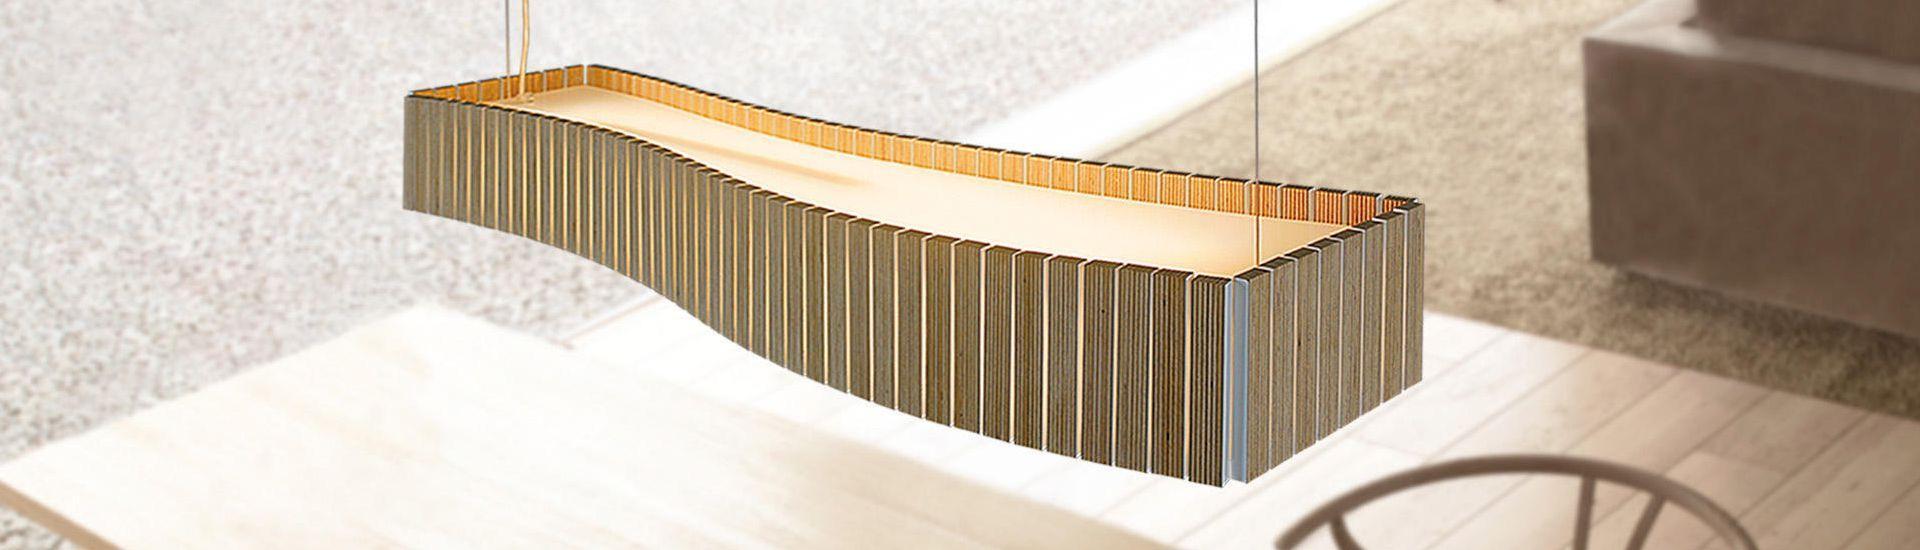 Uxi Lampada a sospensione 2x39W tablero marino